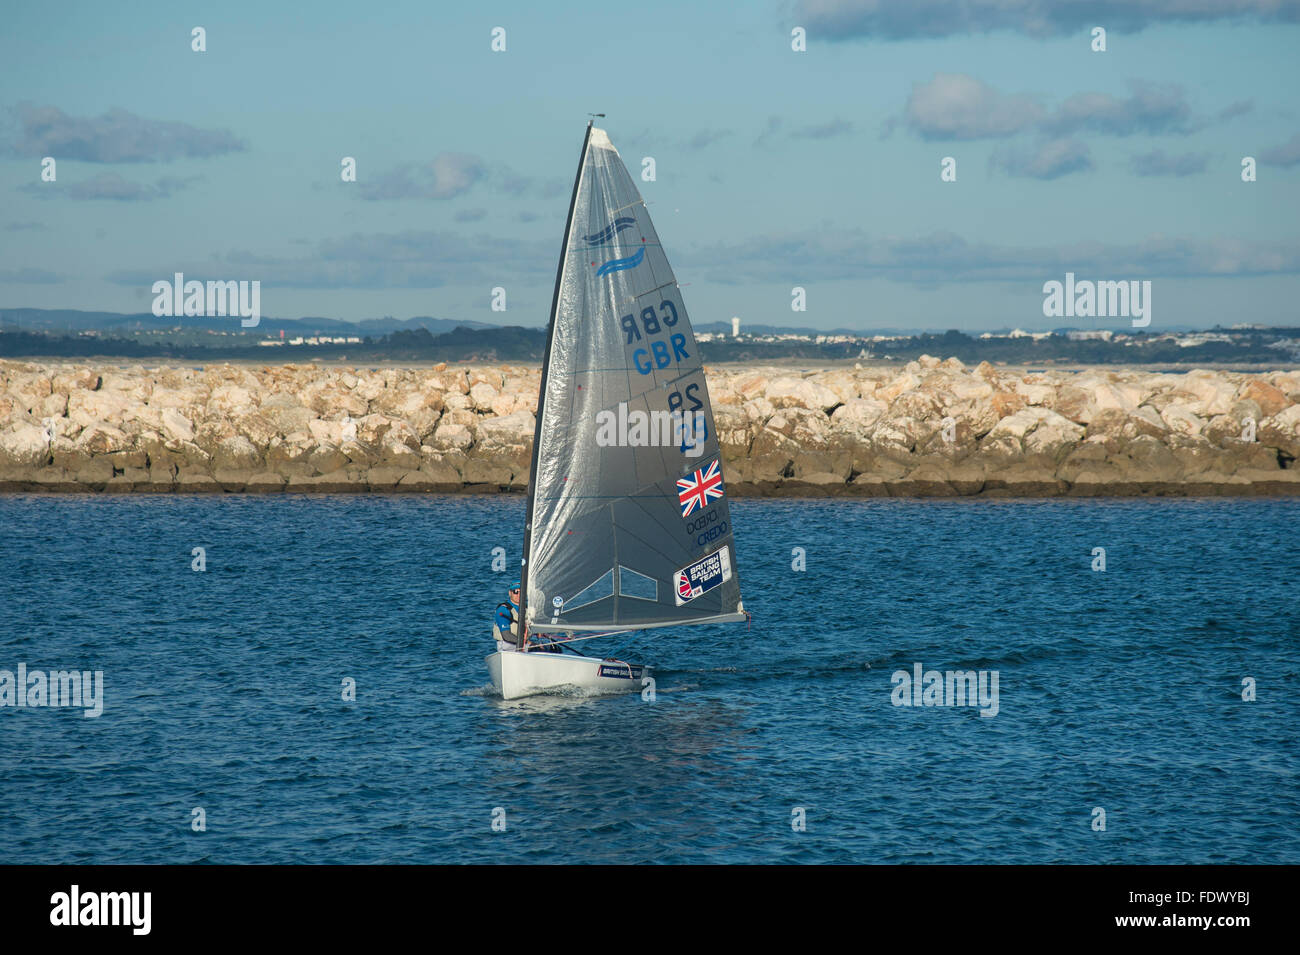 Peter McCoy sailing the International Finn dinghy - Stock Image